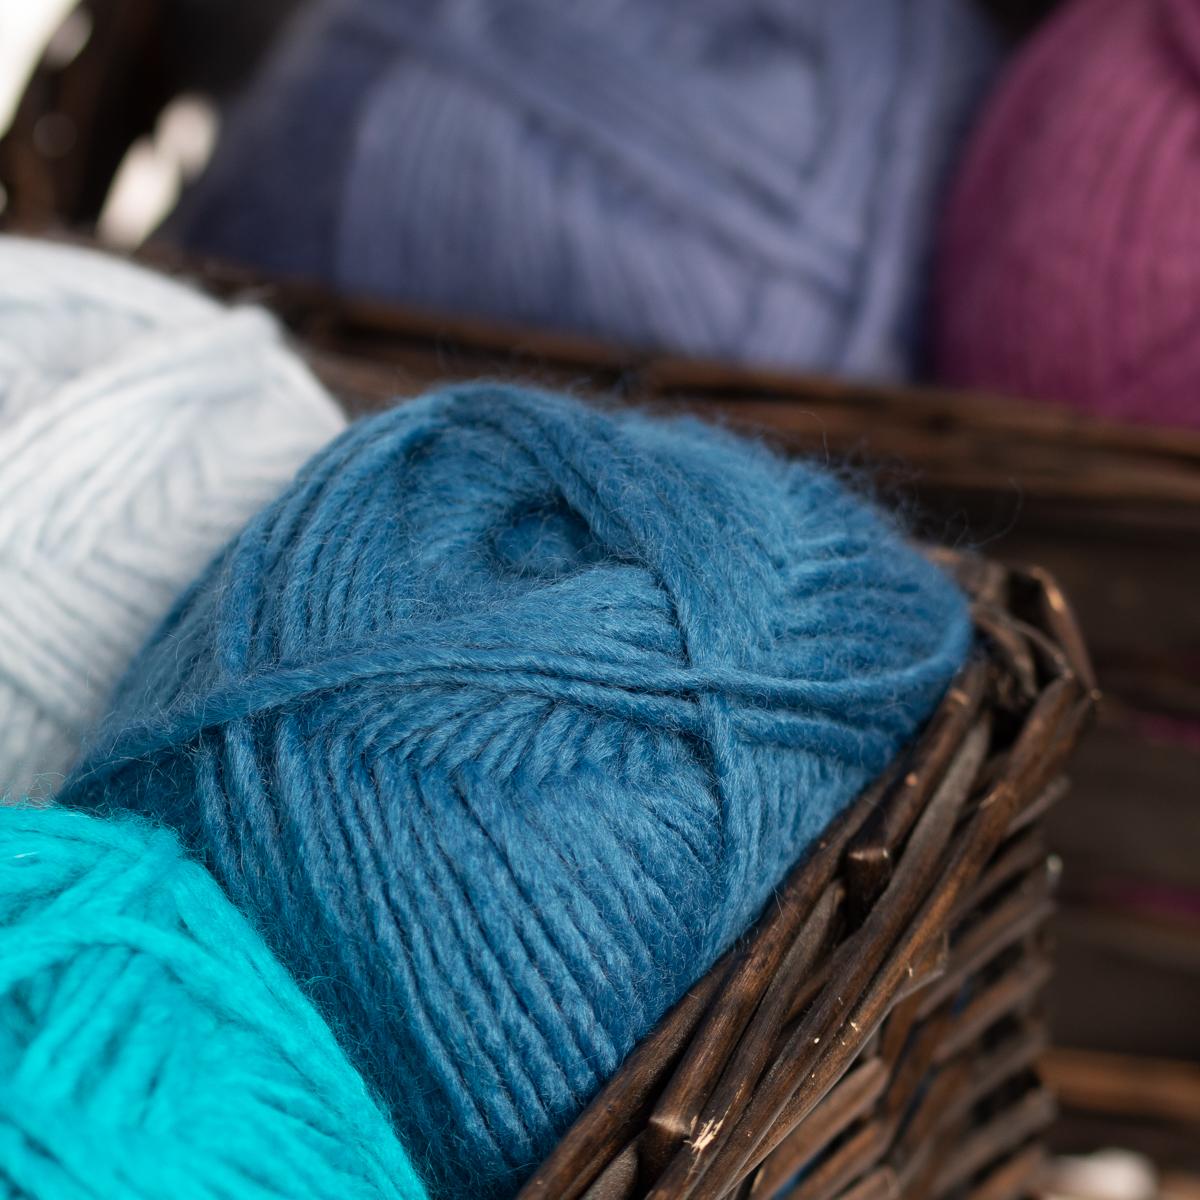 3pk-Lion-Brand-New-Basic-Acrylic-amp-Wool-Yarn-Medium-4-Knit-Crochet-Skeins-Soft thumbnail 70